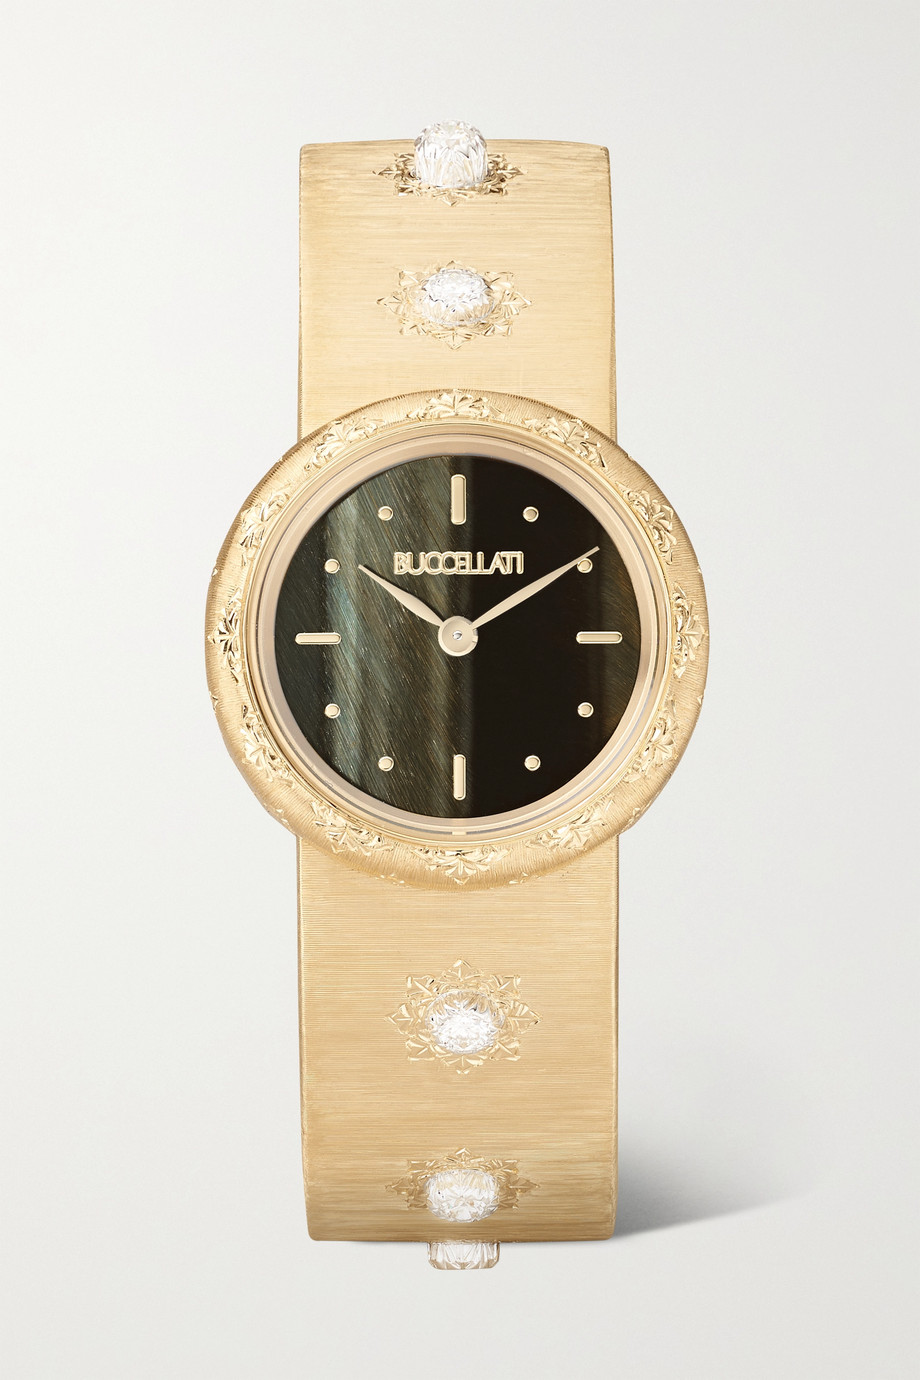 Buccellati Macri 24mm 18-karat gold, hawk's eye and diamond watch